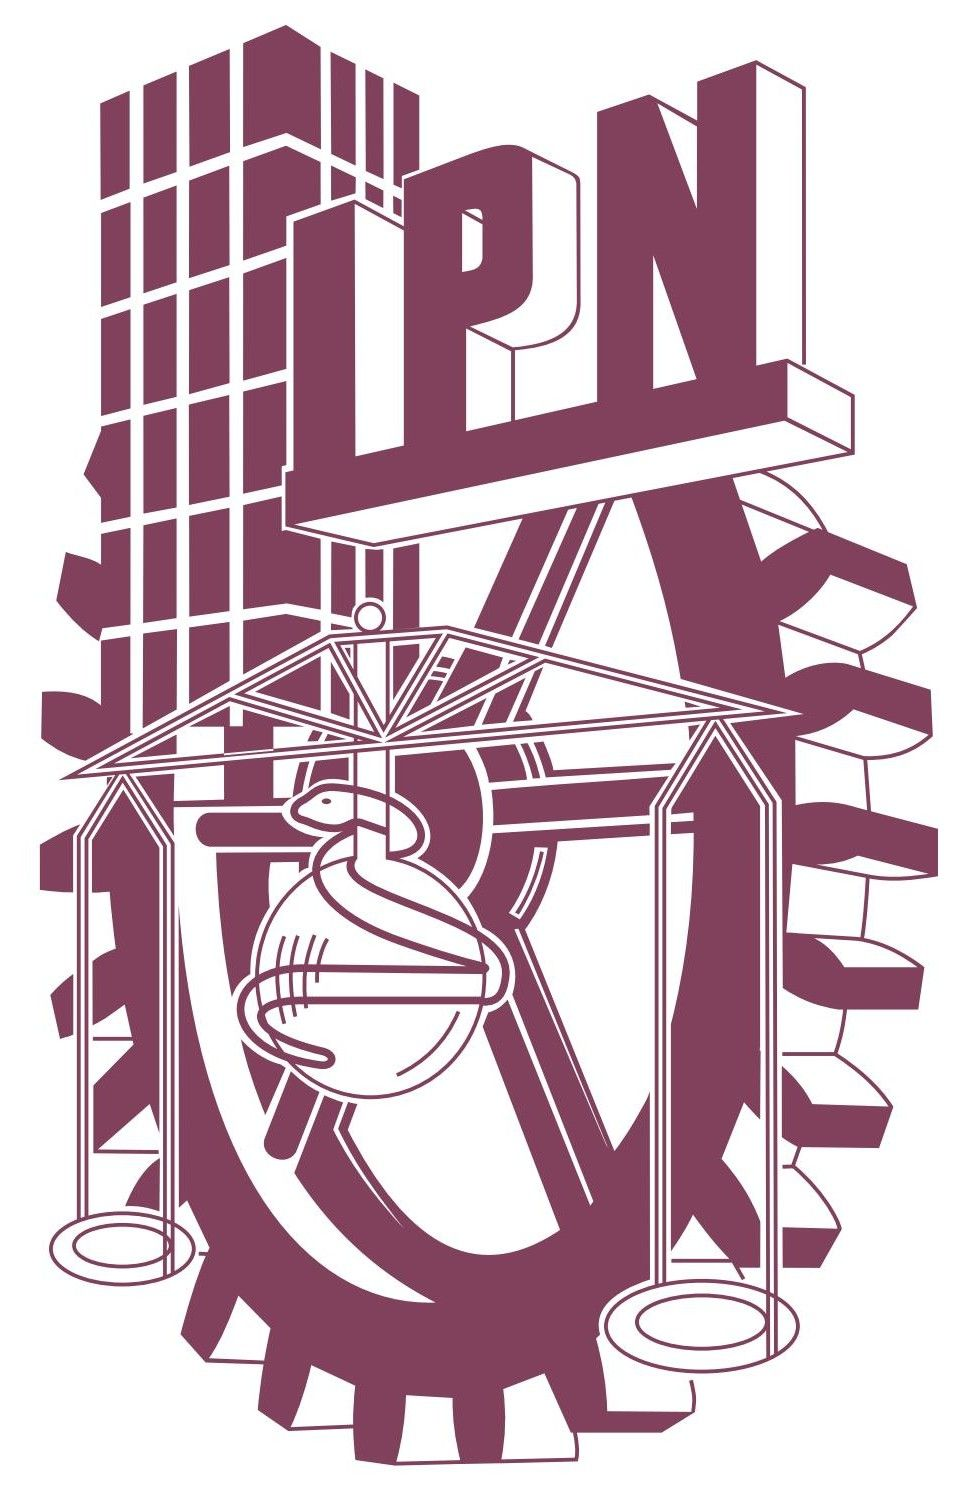 IPN Logo [National Polytechnic Institute], 2019